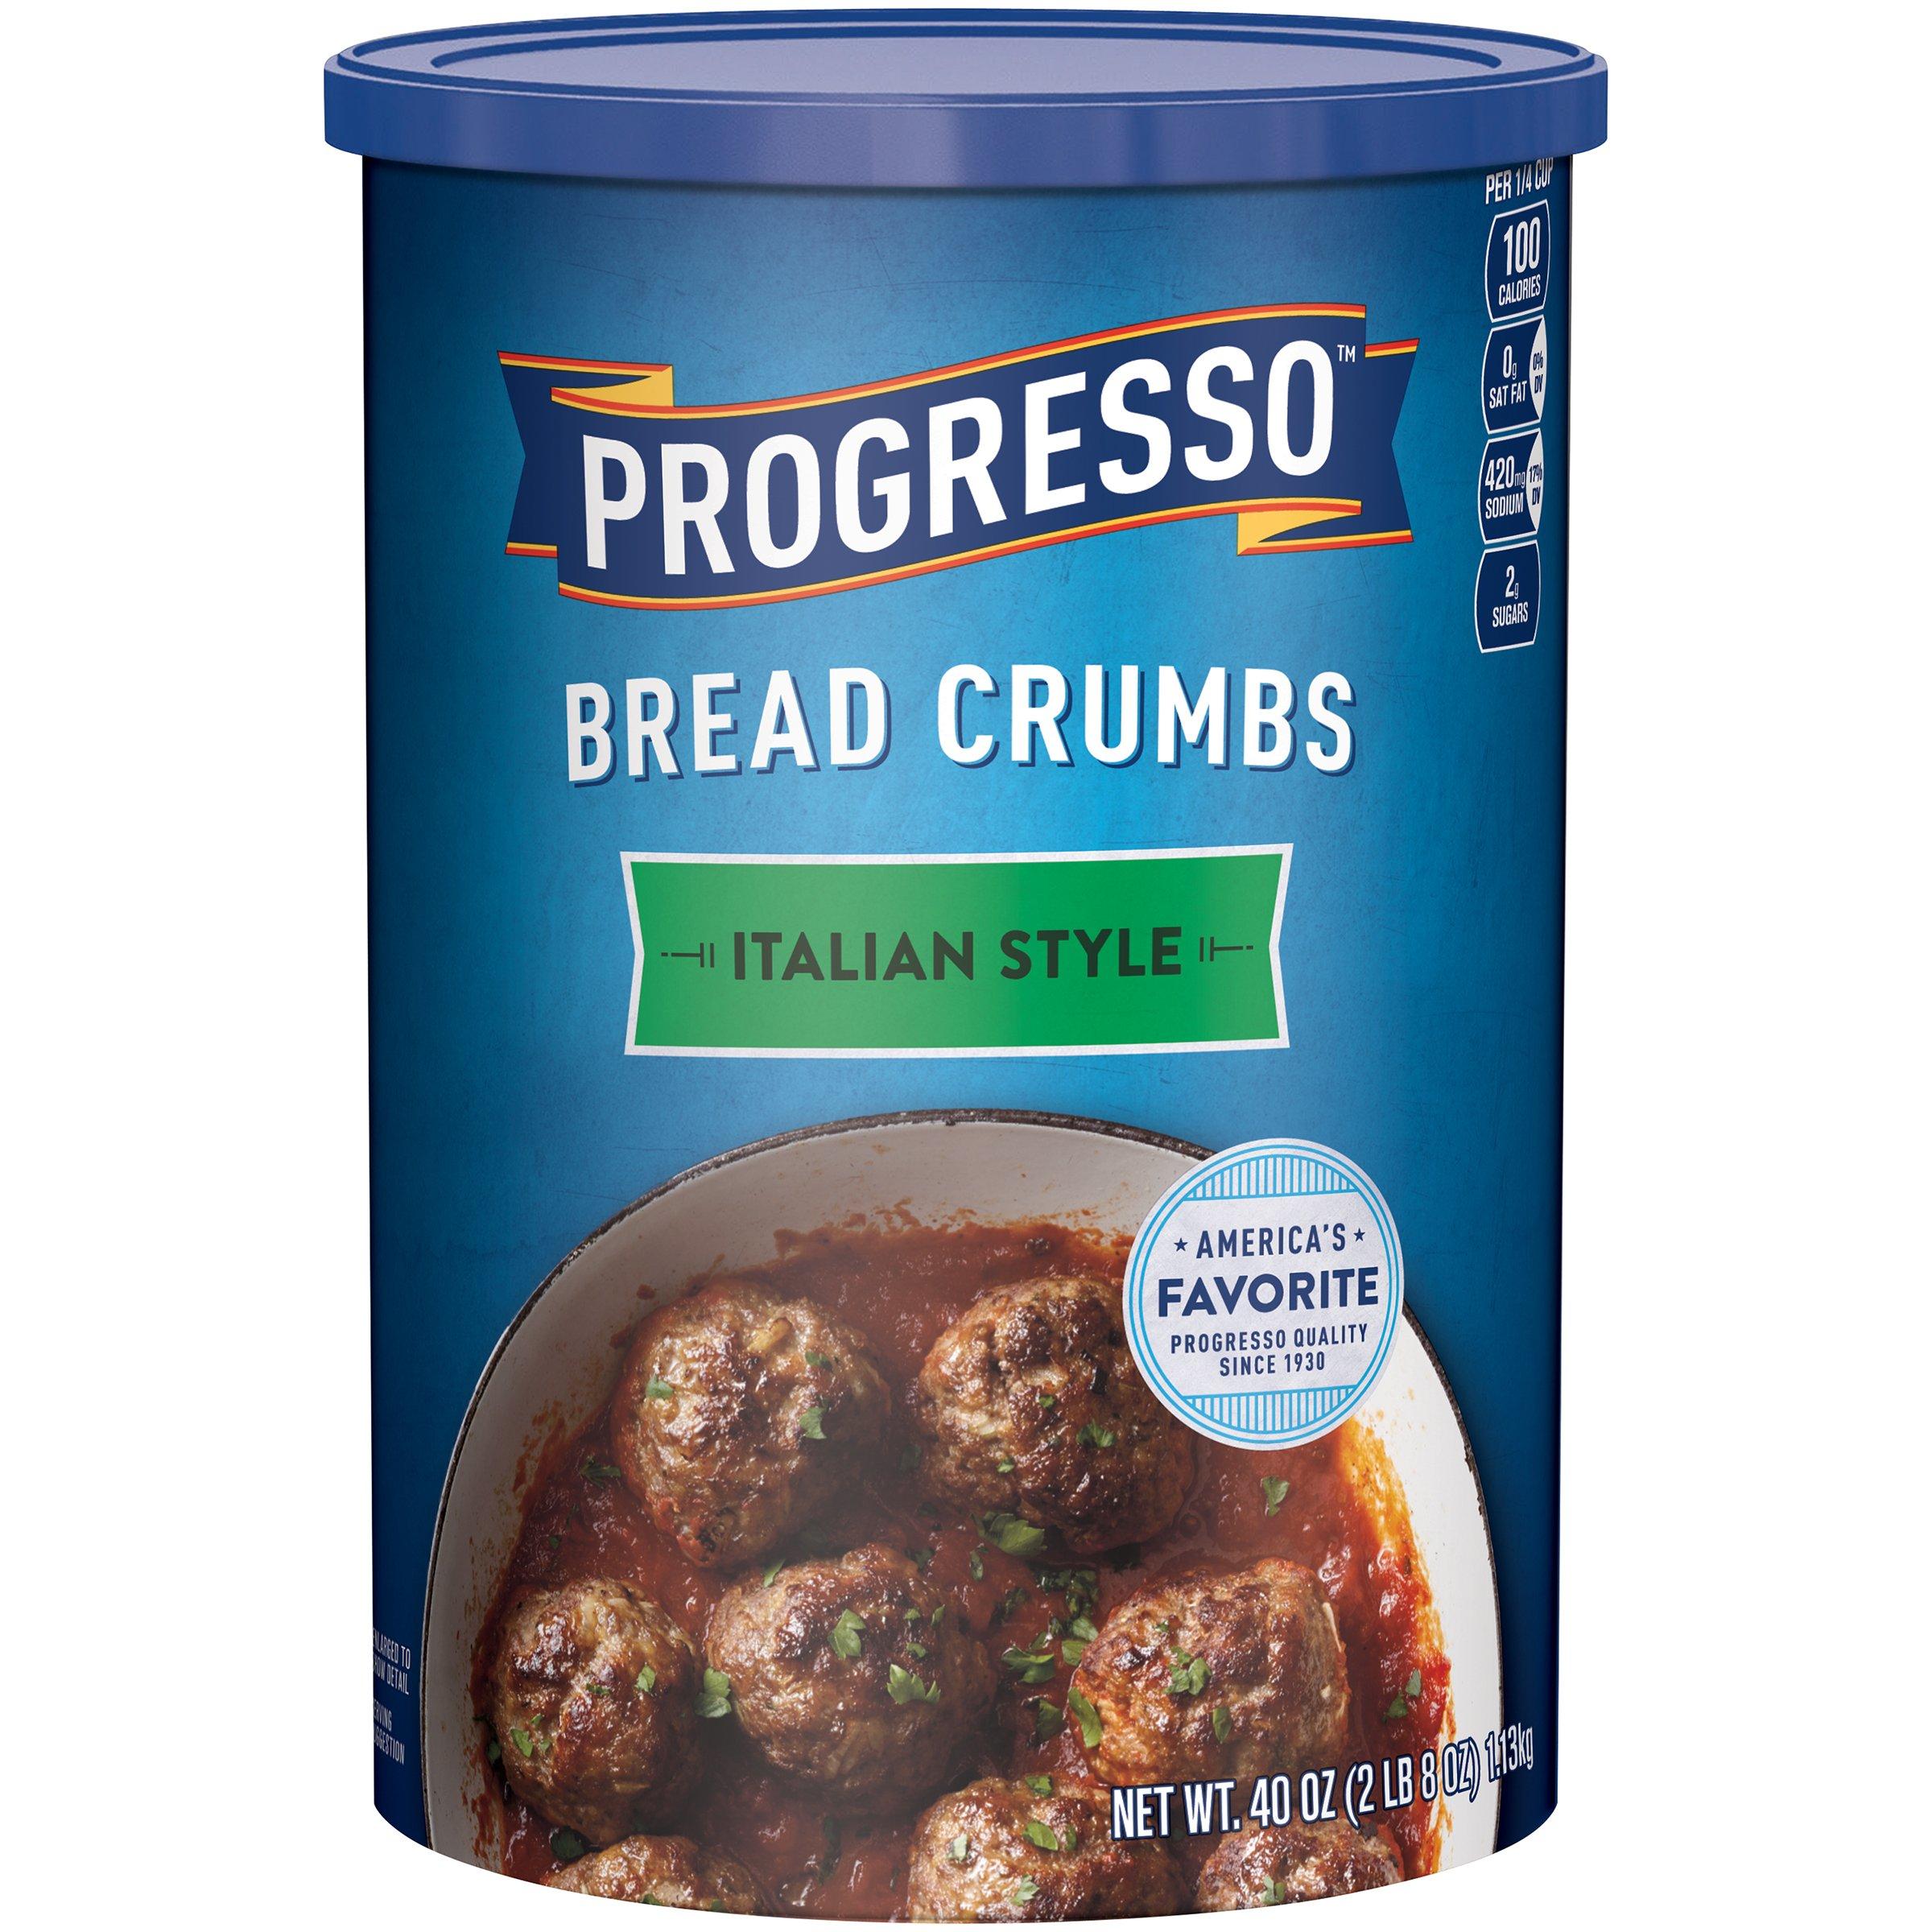 Progresso Italian Style Bread Crumbs, 40 oz (Pack of 3) by Progresso